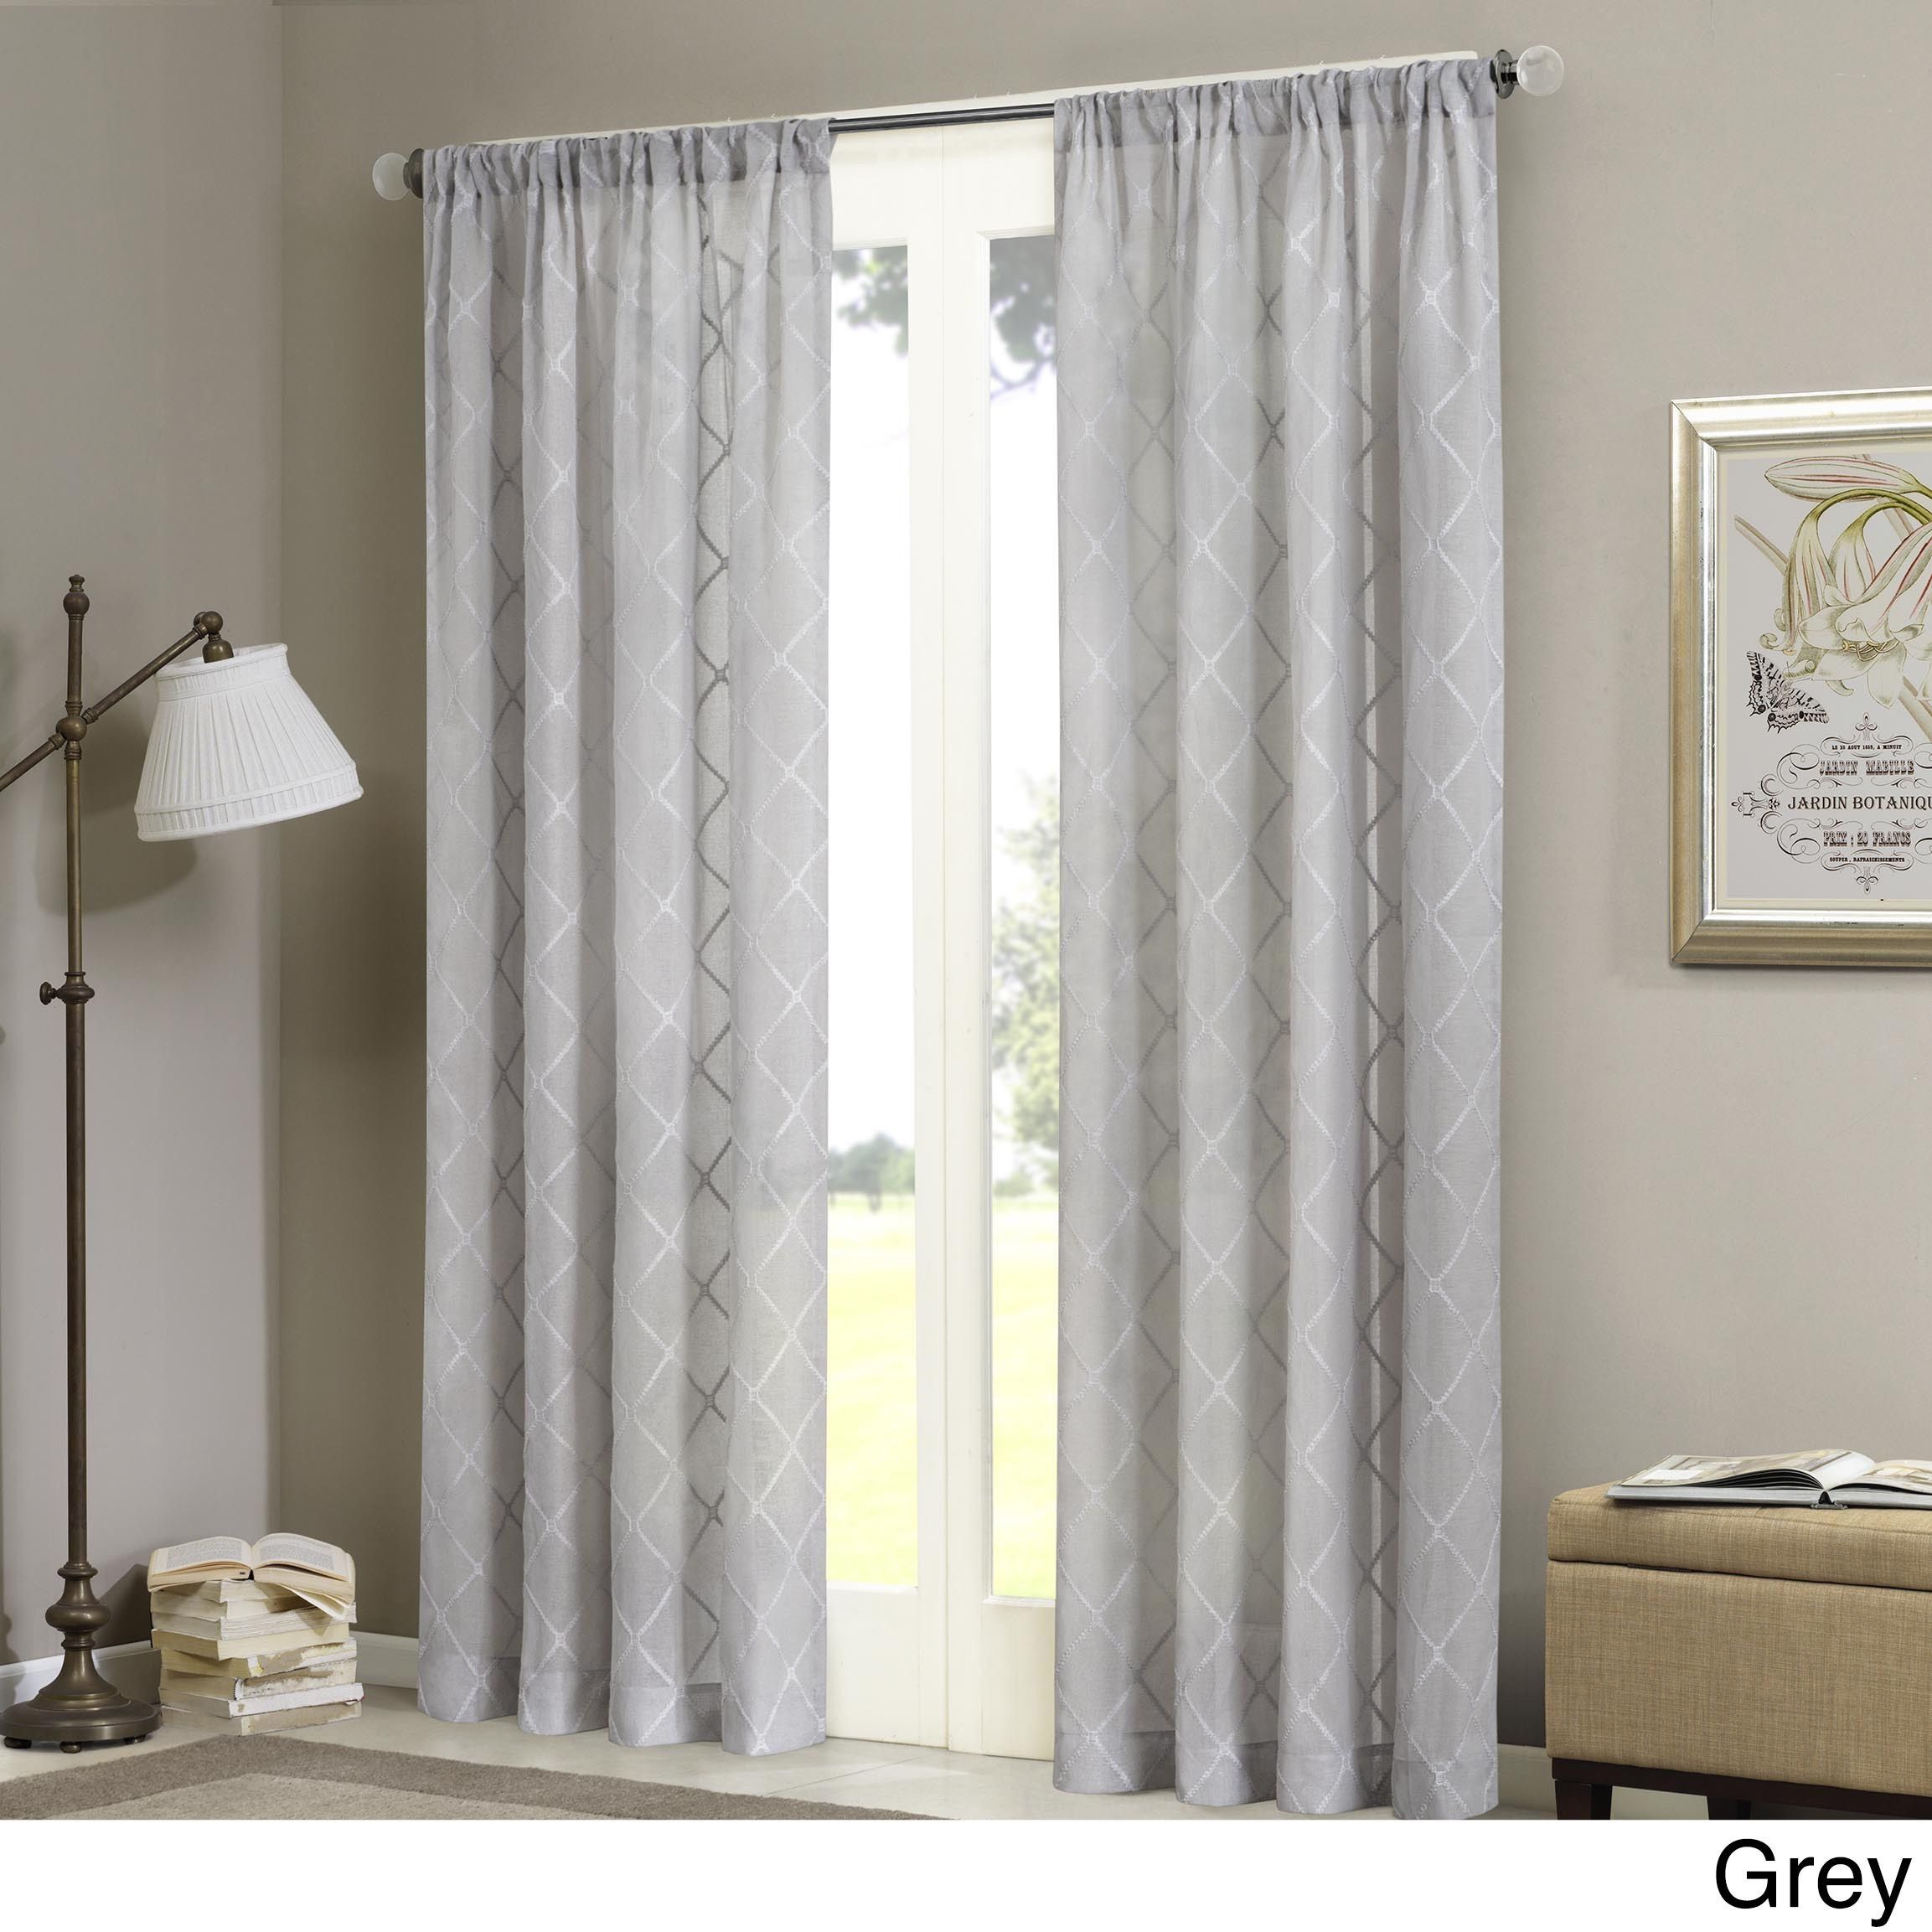 Madison Park Iris Embroidered Diamond Sheer Curtain Panel 50x84 White Grey White Size 50 X 84 Poly Panel Curtains Sheer Window Panels Sheer Curtain Panels